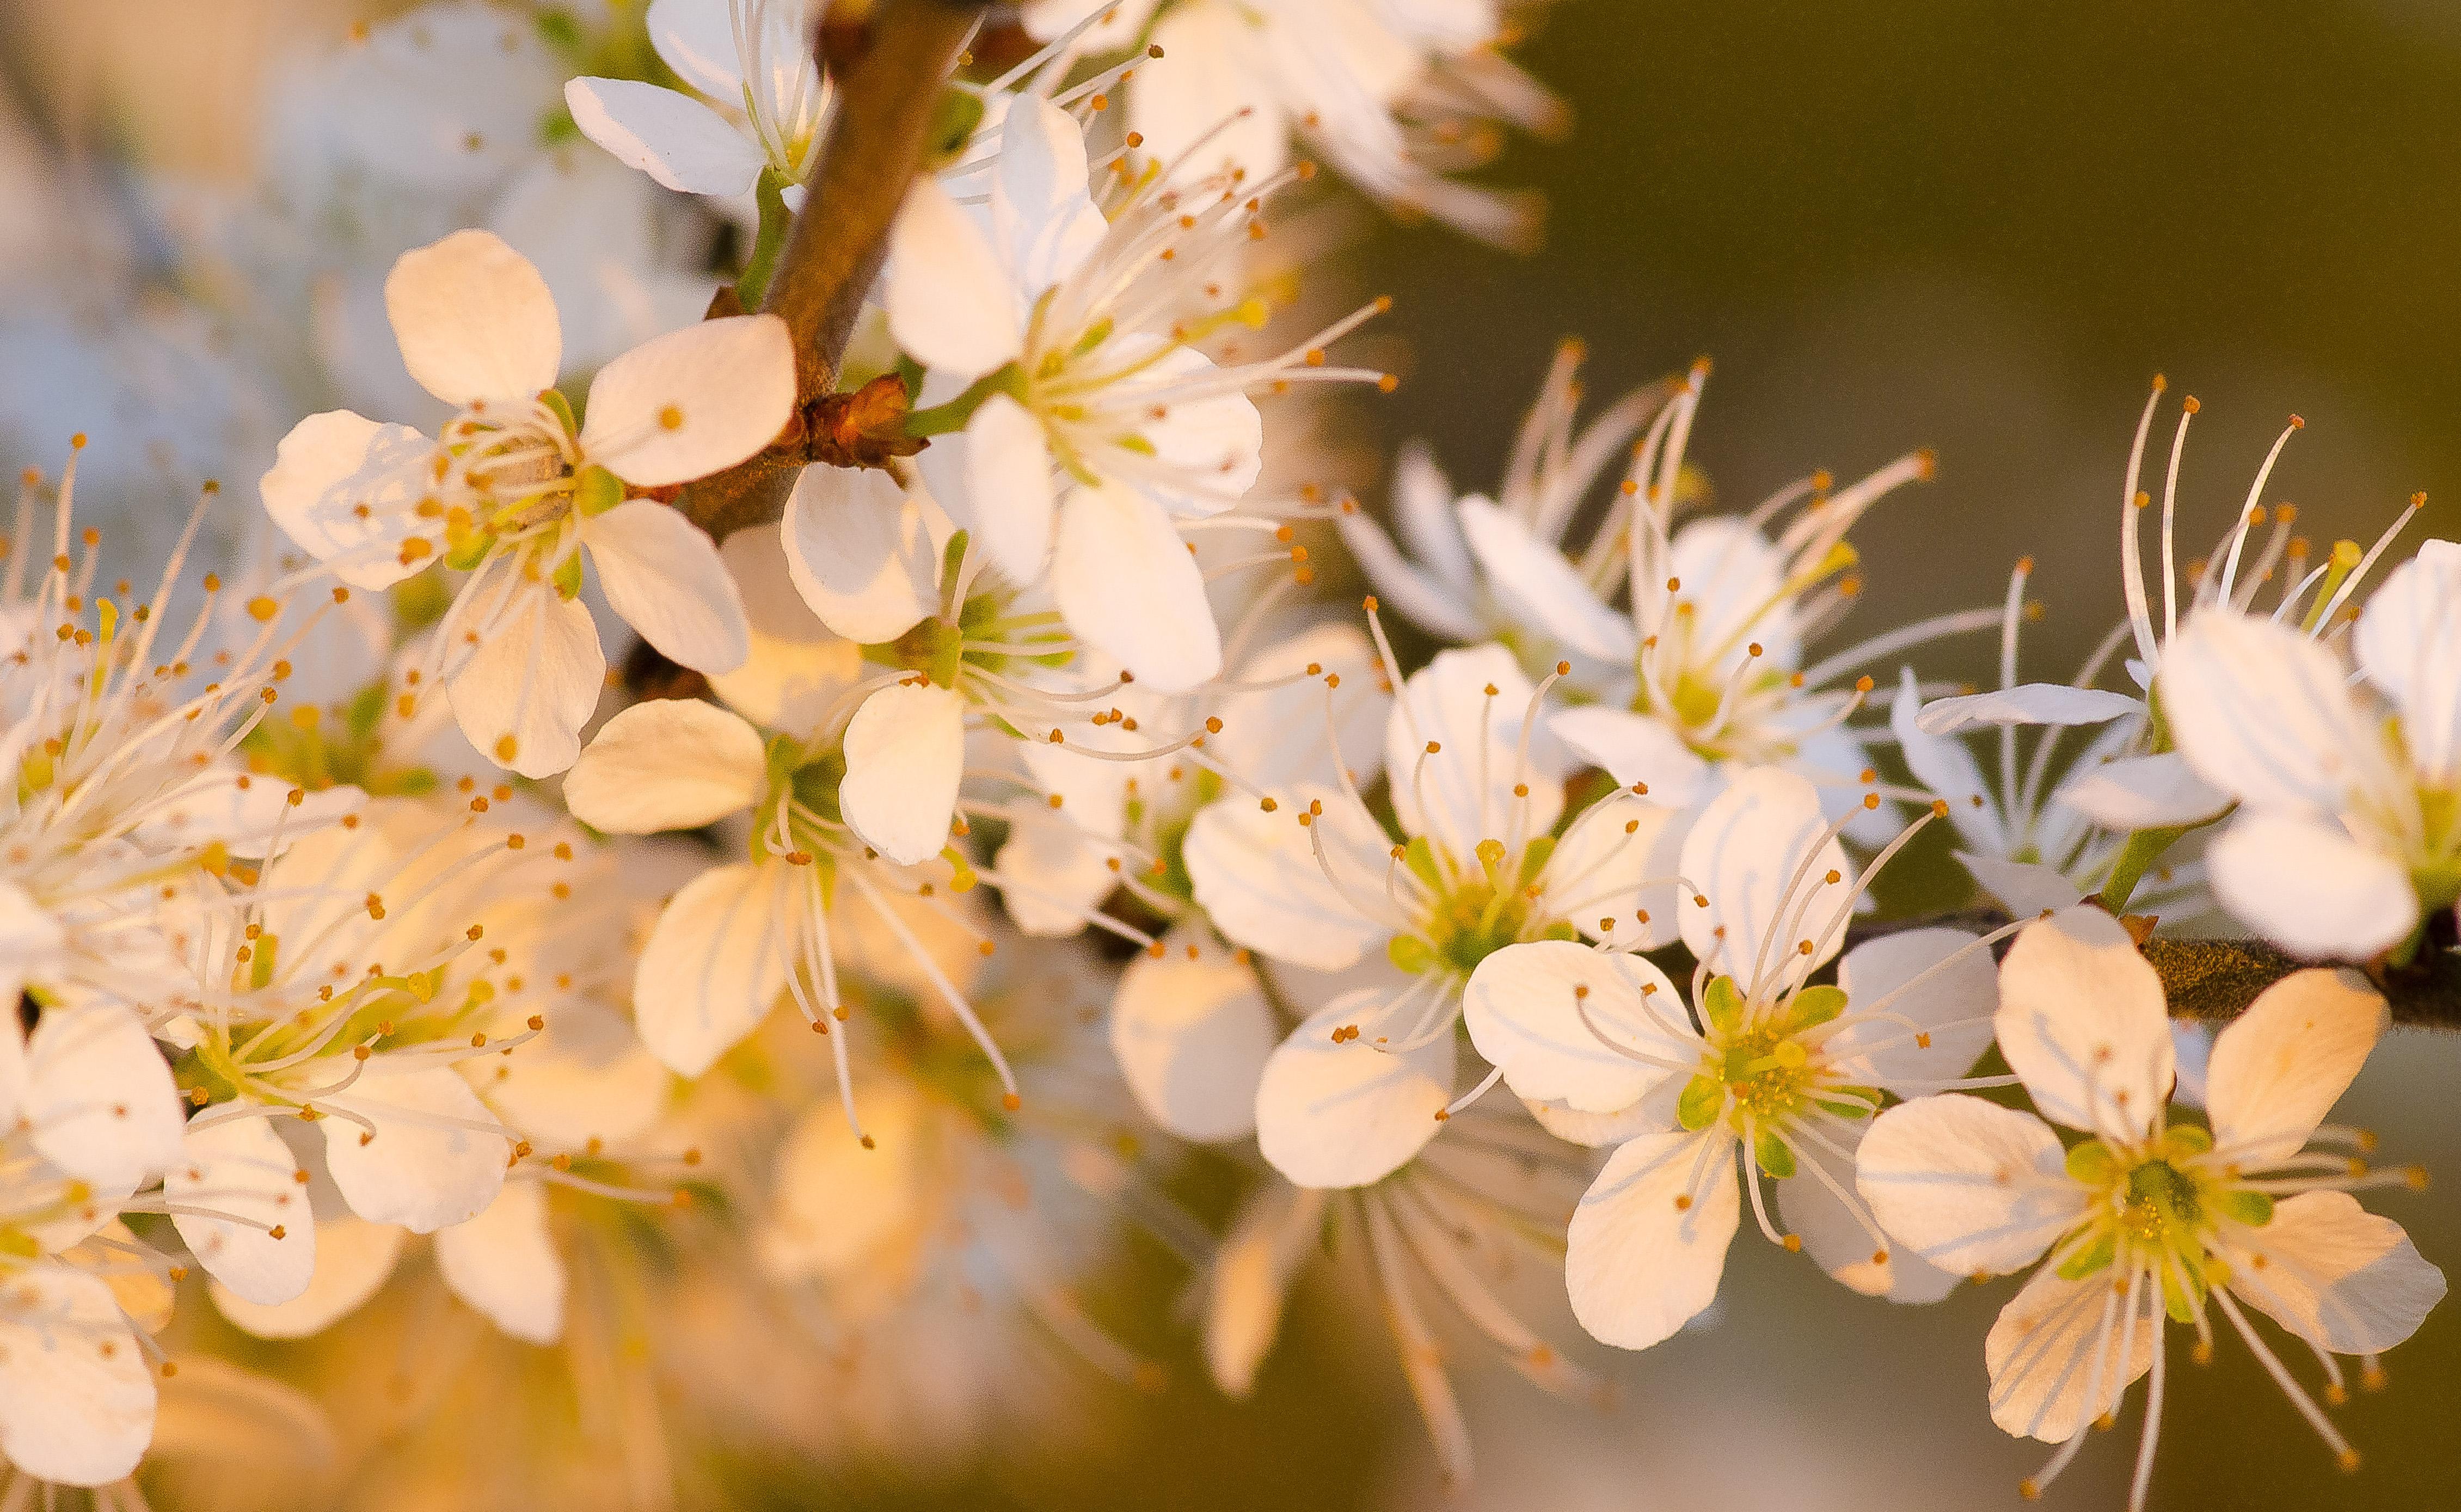 Flores blancas al atardecer - 4521x2778